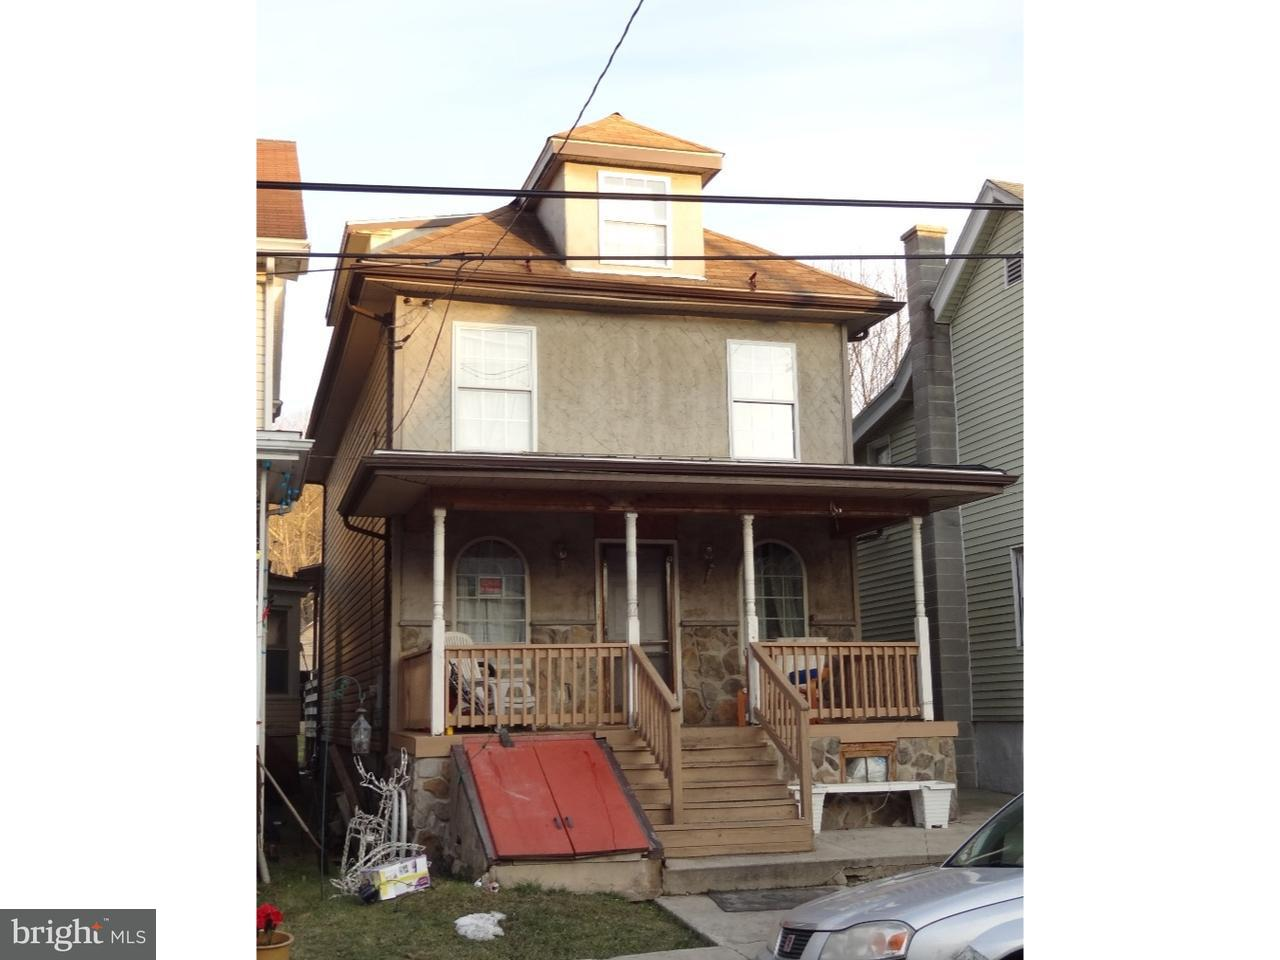 Single Family Home for Sale at 88 WASHINGTON Street Middleport, Pennsylvania 17953 United States